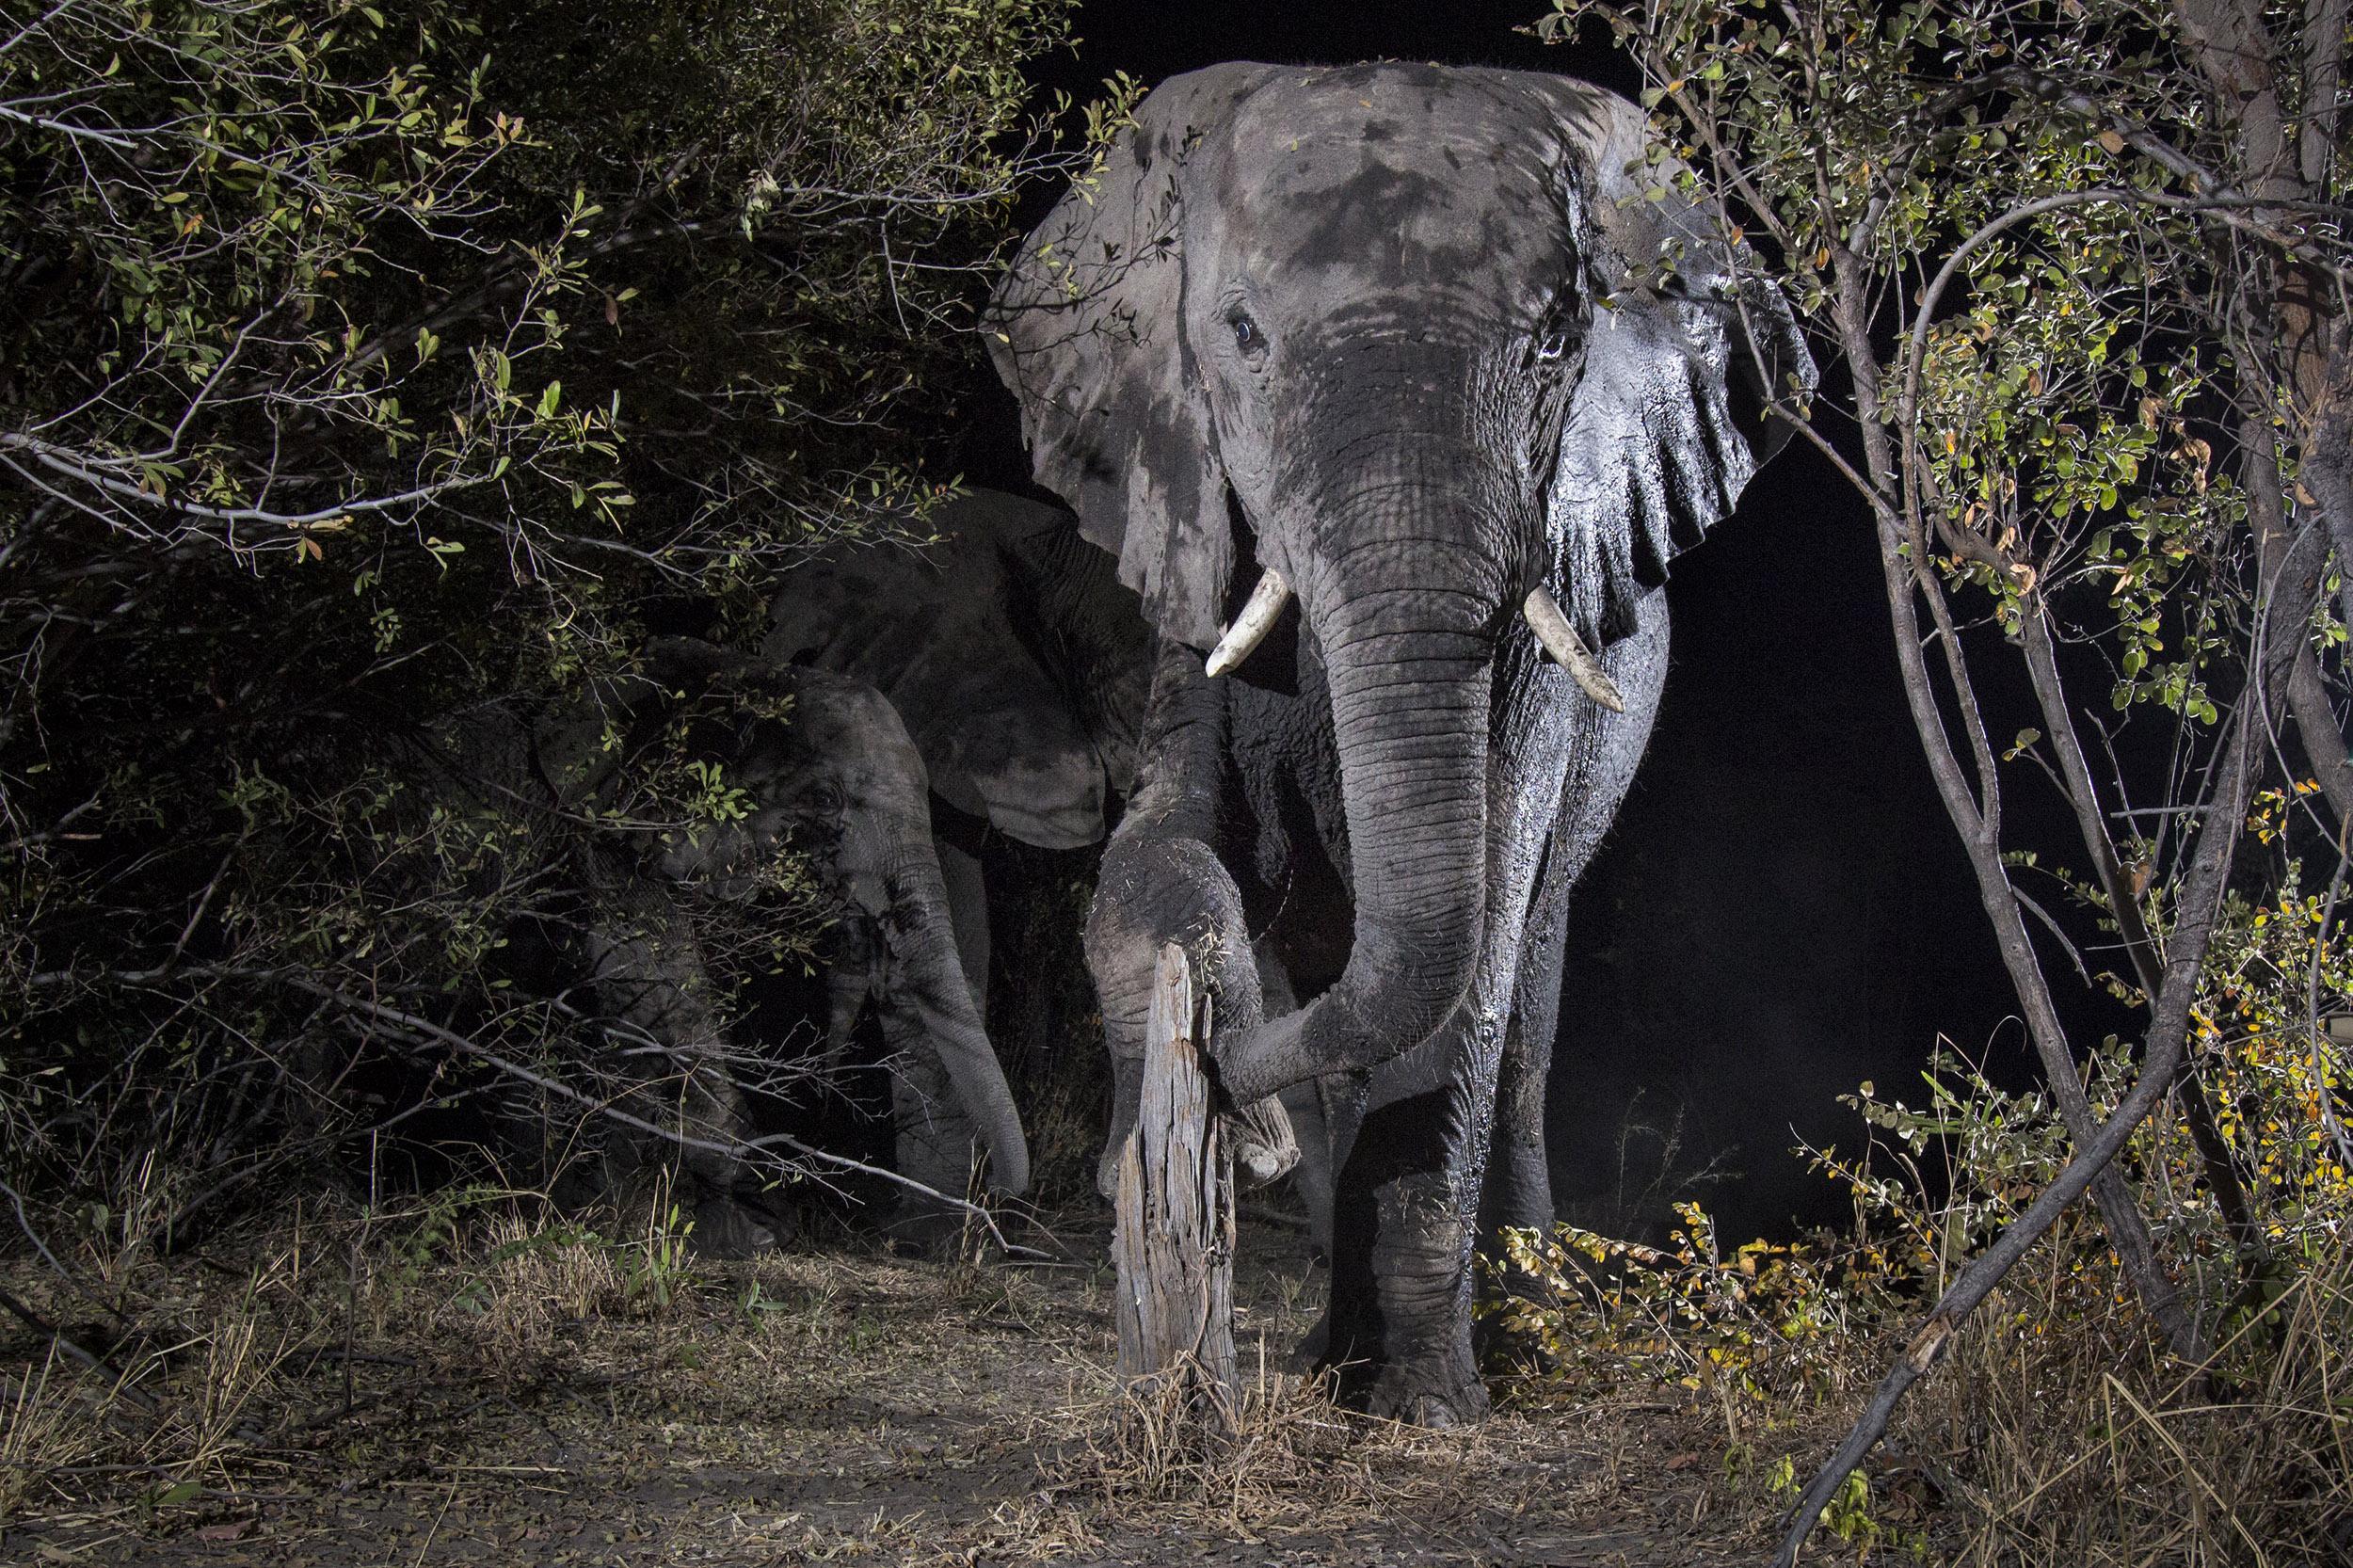 A camera trap image of an elephant using Camtraptions PIR motion sensor.